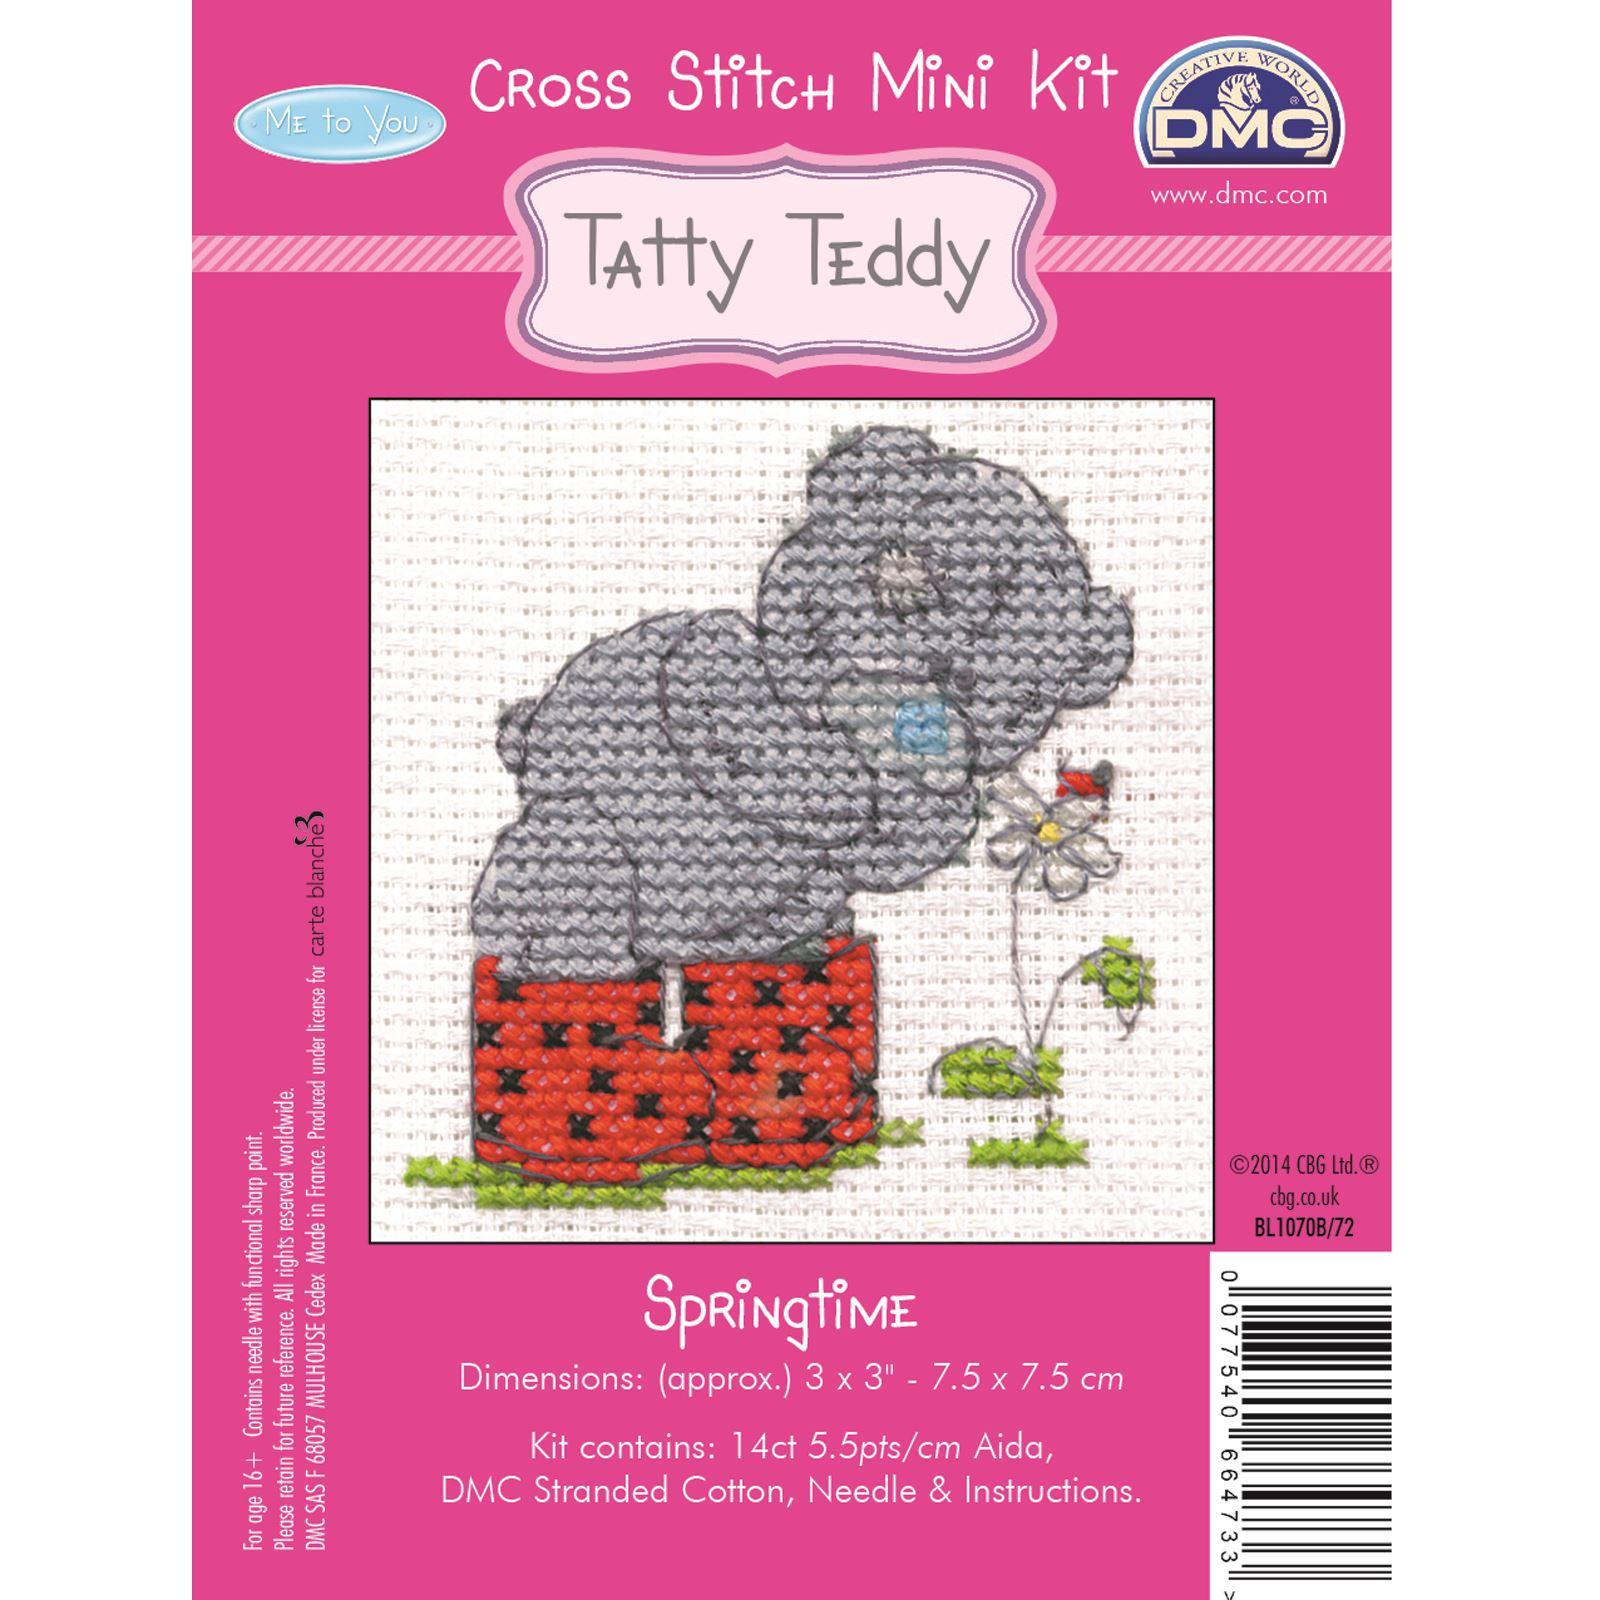 DMC-Mini-Cross-Stitch-Kit-Me-to-You-Tatty-Teddy-8-Designs thumbnail 13